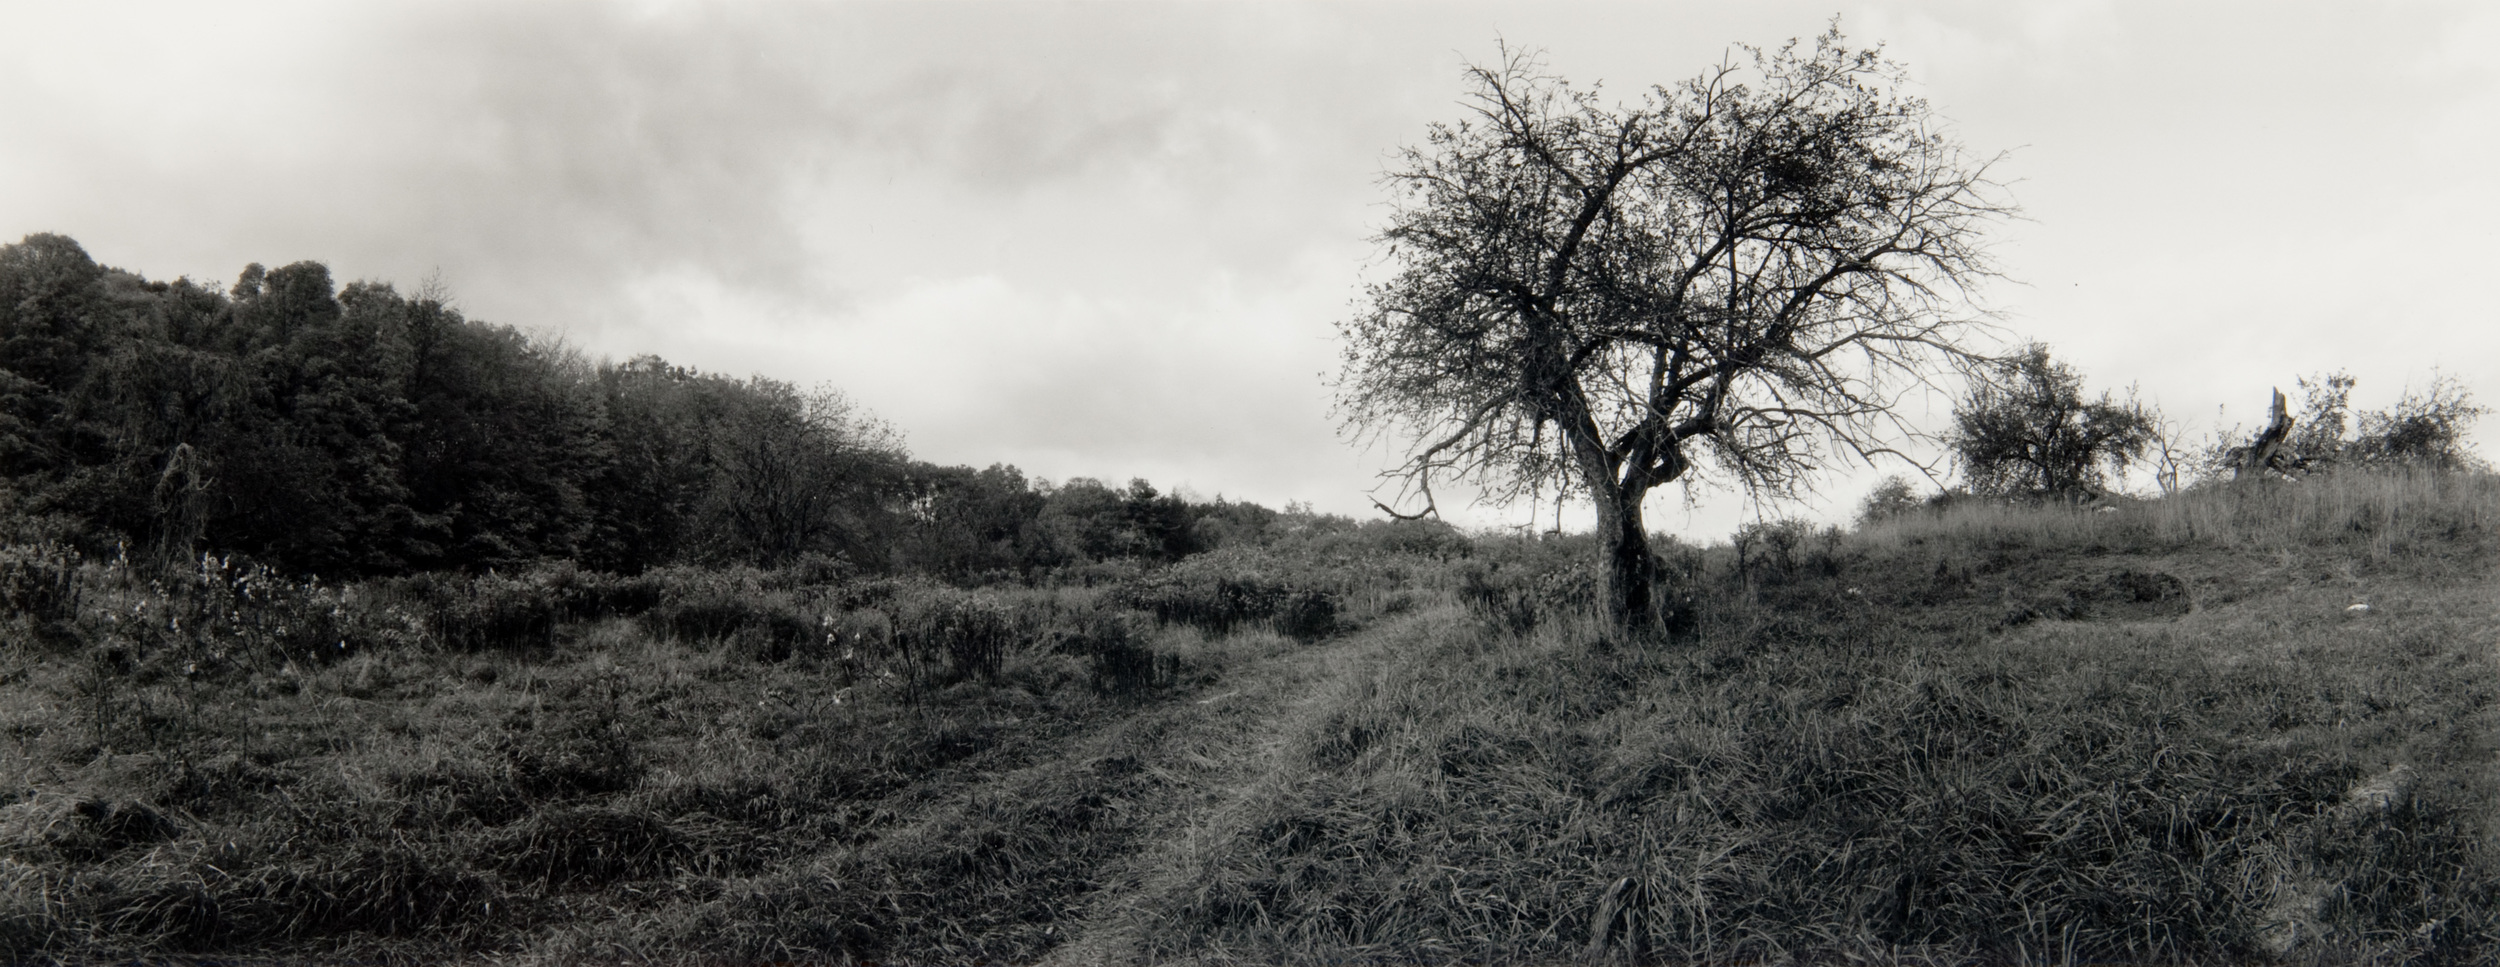 E. Lindbloom, Winston Farm, Saugerties, 1998,gsp.jpg